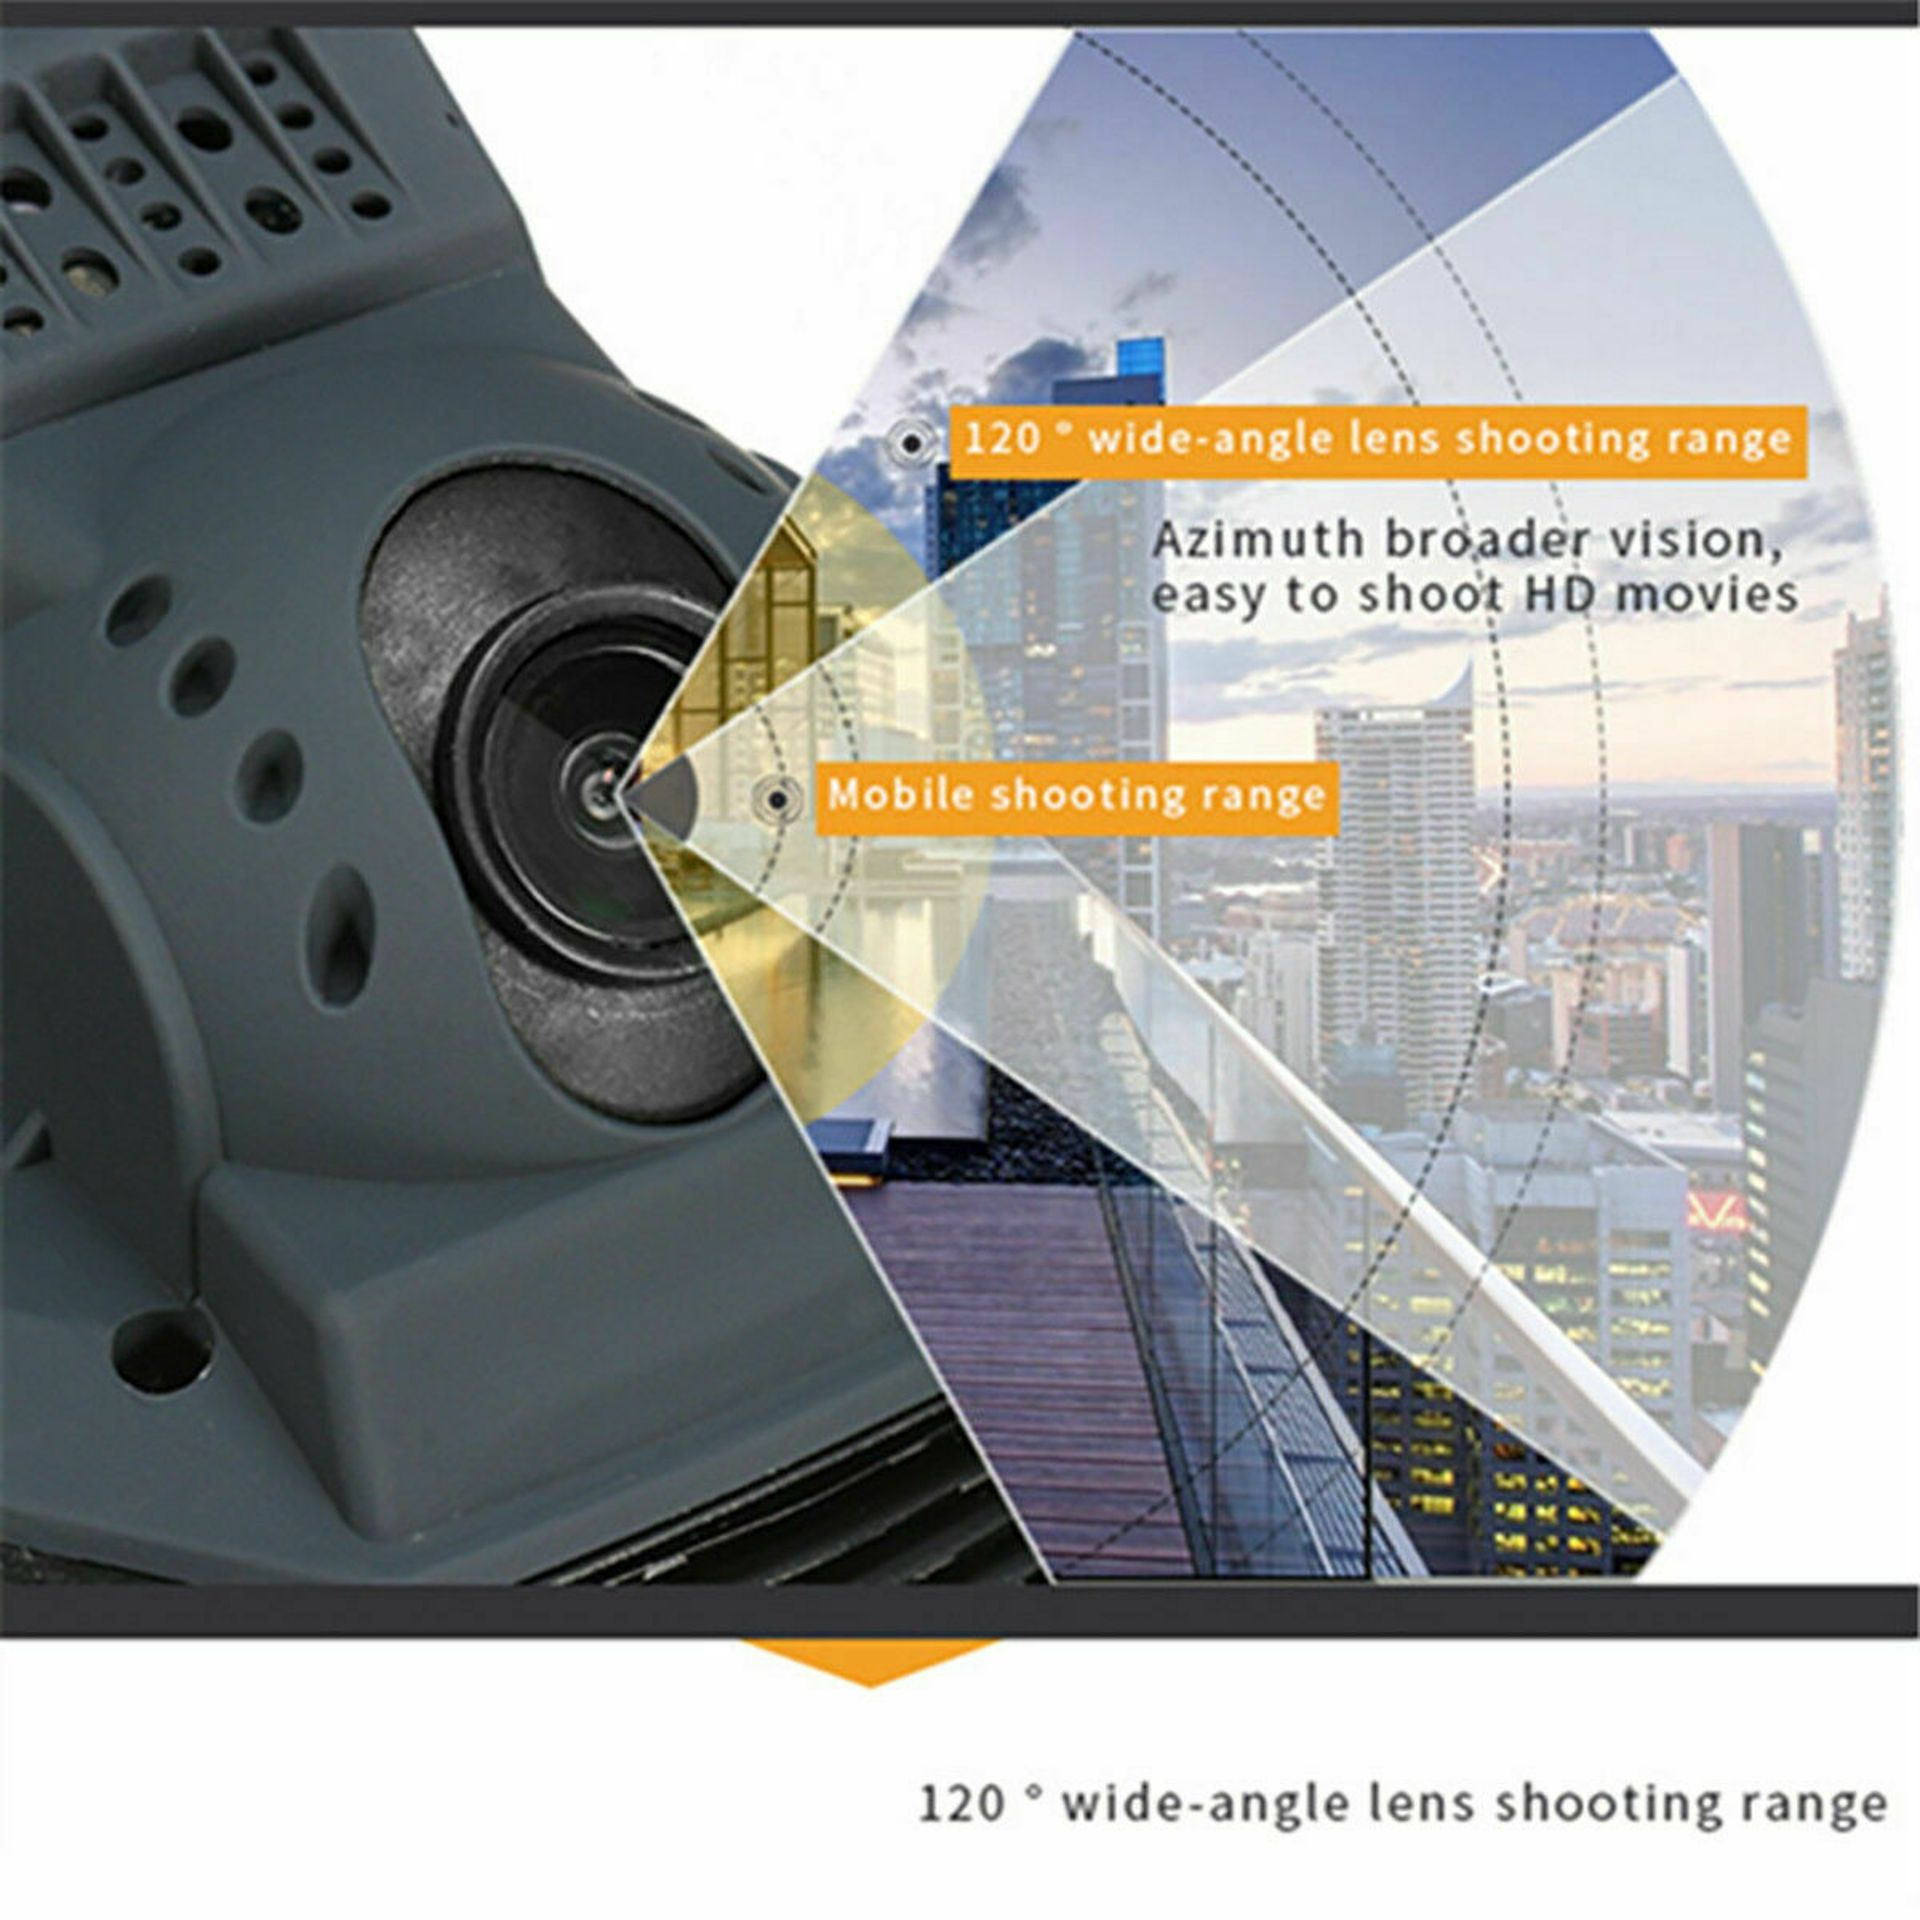 NEW & UNUSED DRONE X PRO WIFI FPV 1080P HD CAMERA FOLDABLE RC QUADCOPTER + BAG *PLUS VAT* - Image 8 of 12